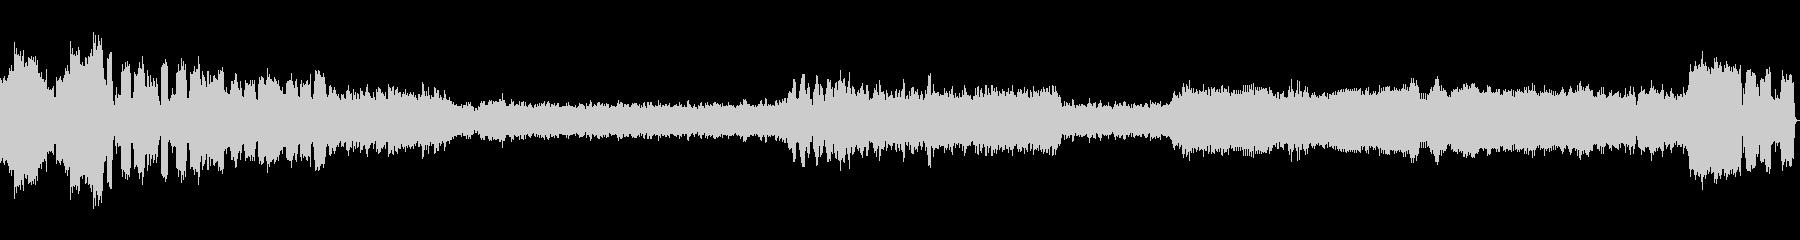 「BGMの宝庫4」-シャコンヌAよりの未再生の波形